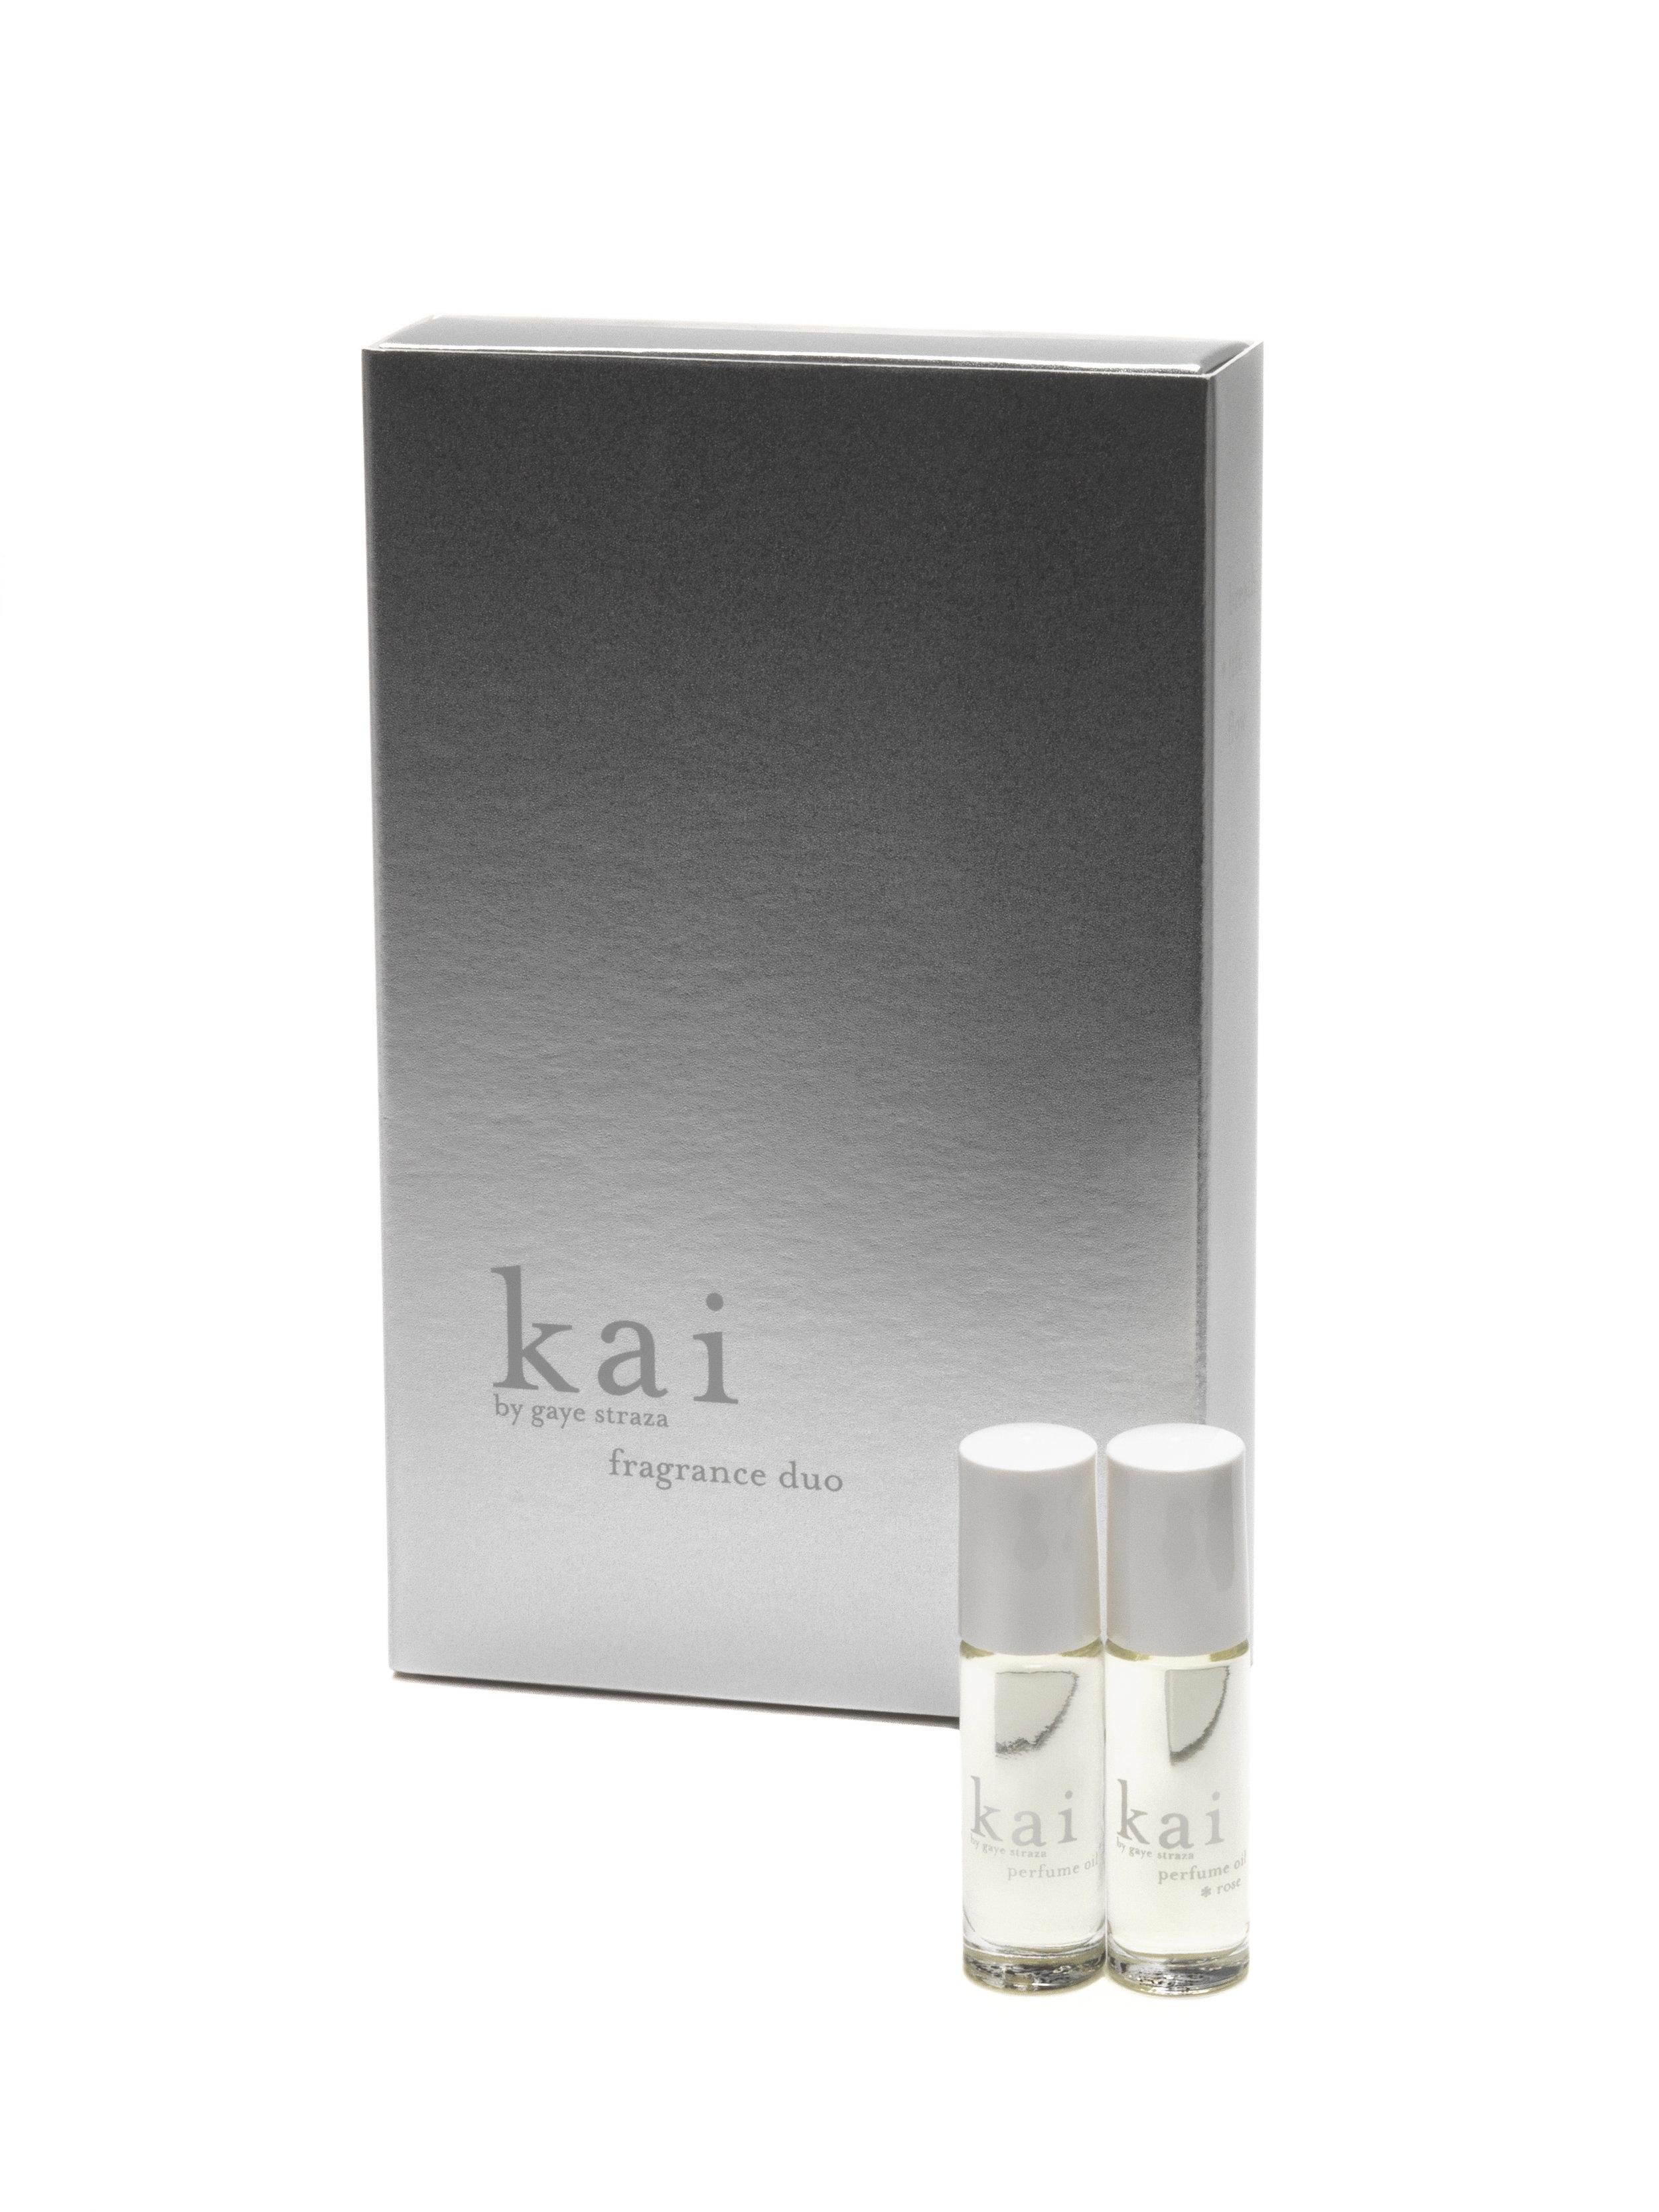 kai fragrance duo.jpg